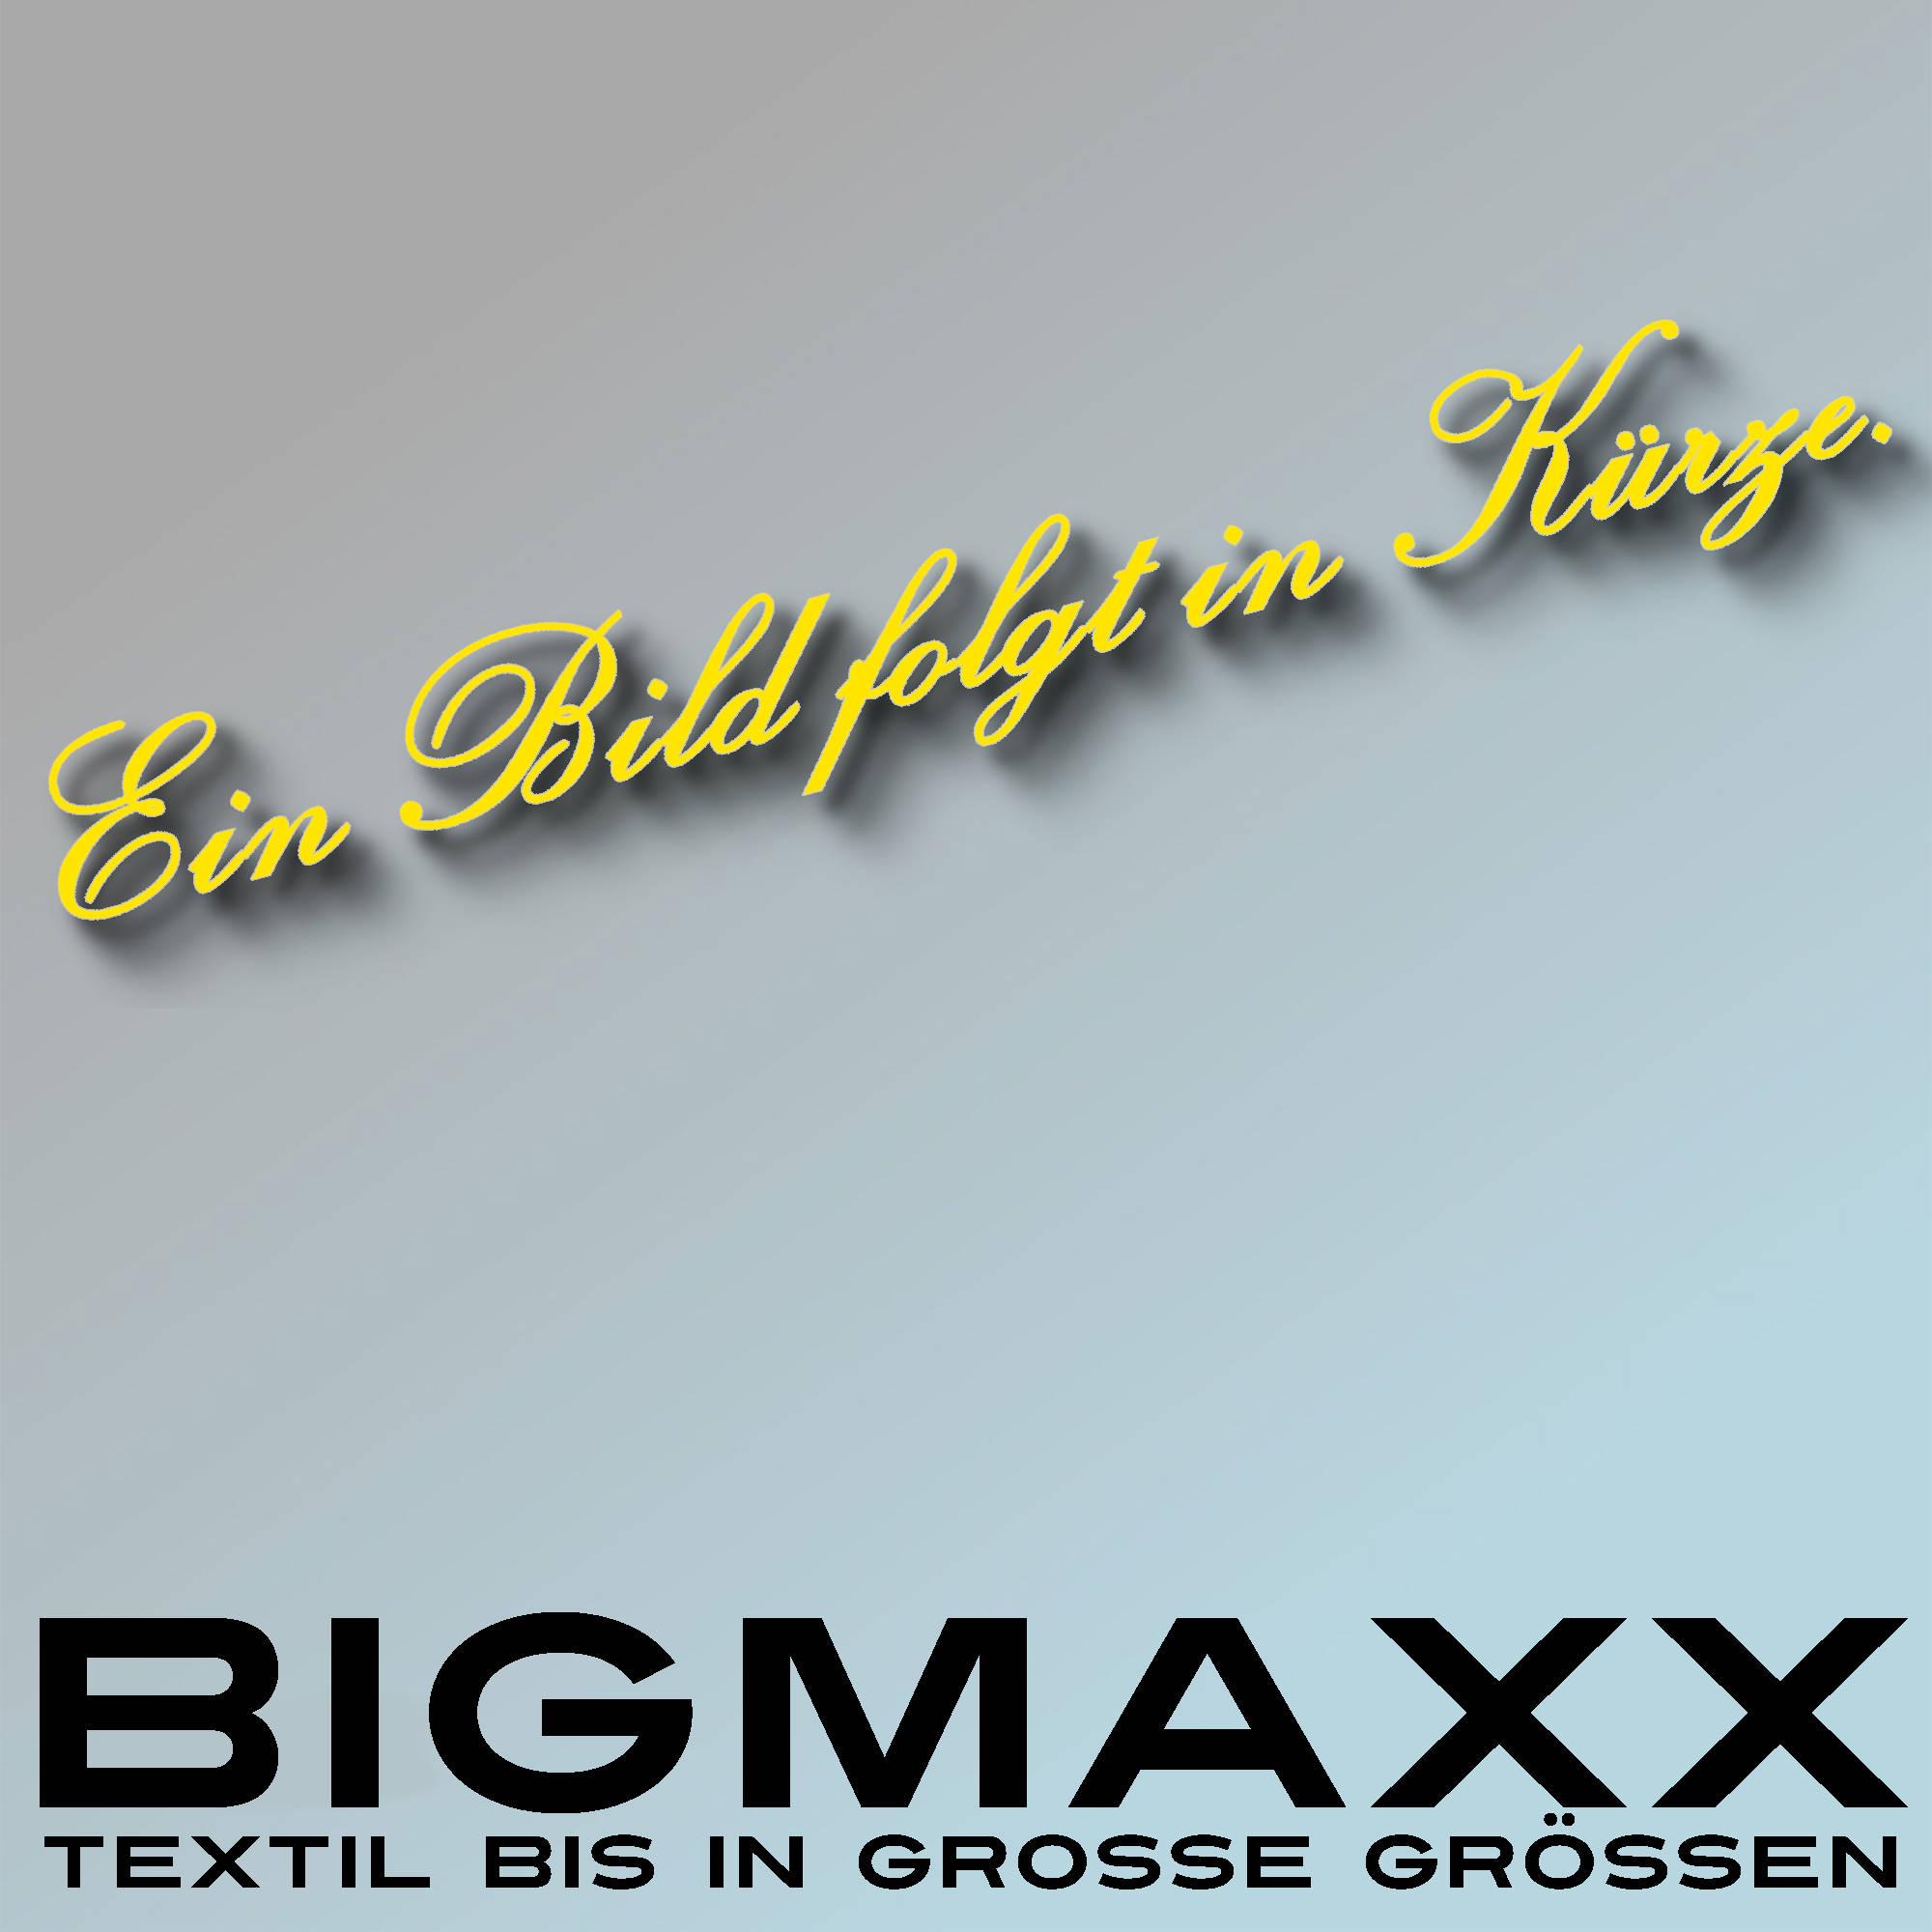 Kariban Damen Kurzarm T-Shirt mit U-Boot Ausschnitt in 7 Farben Gr S bis 3XL